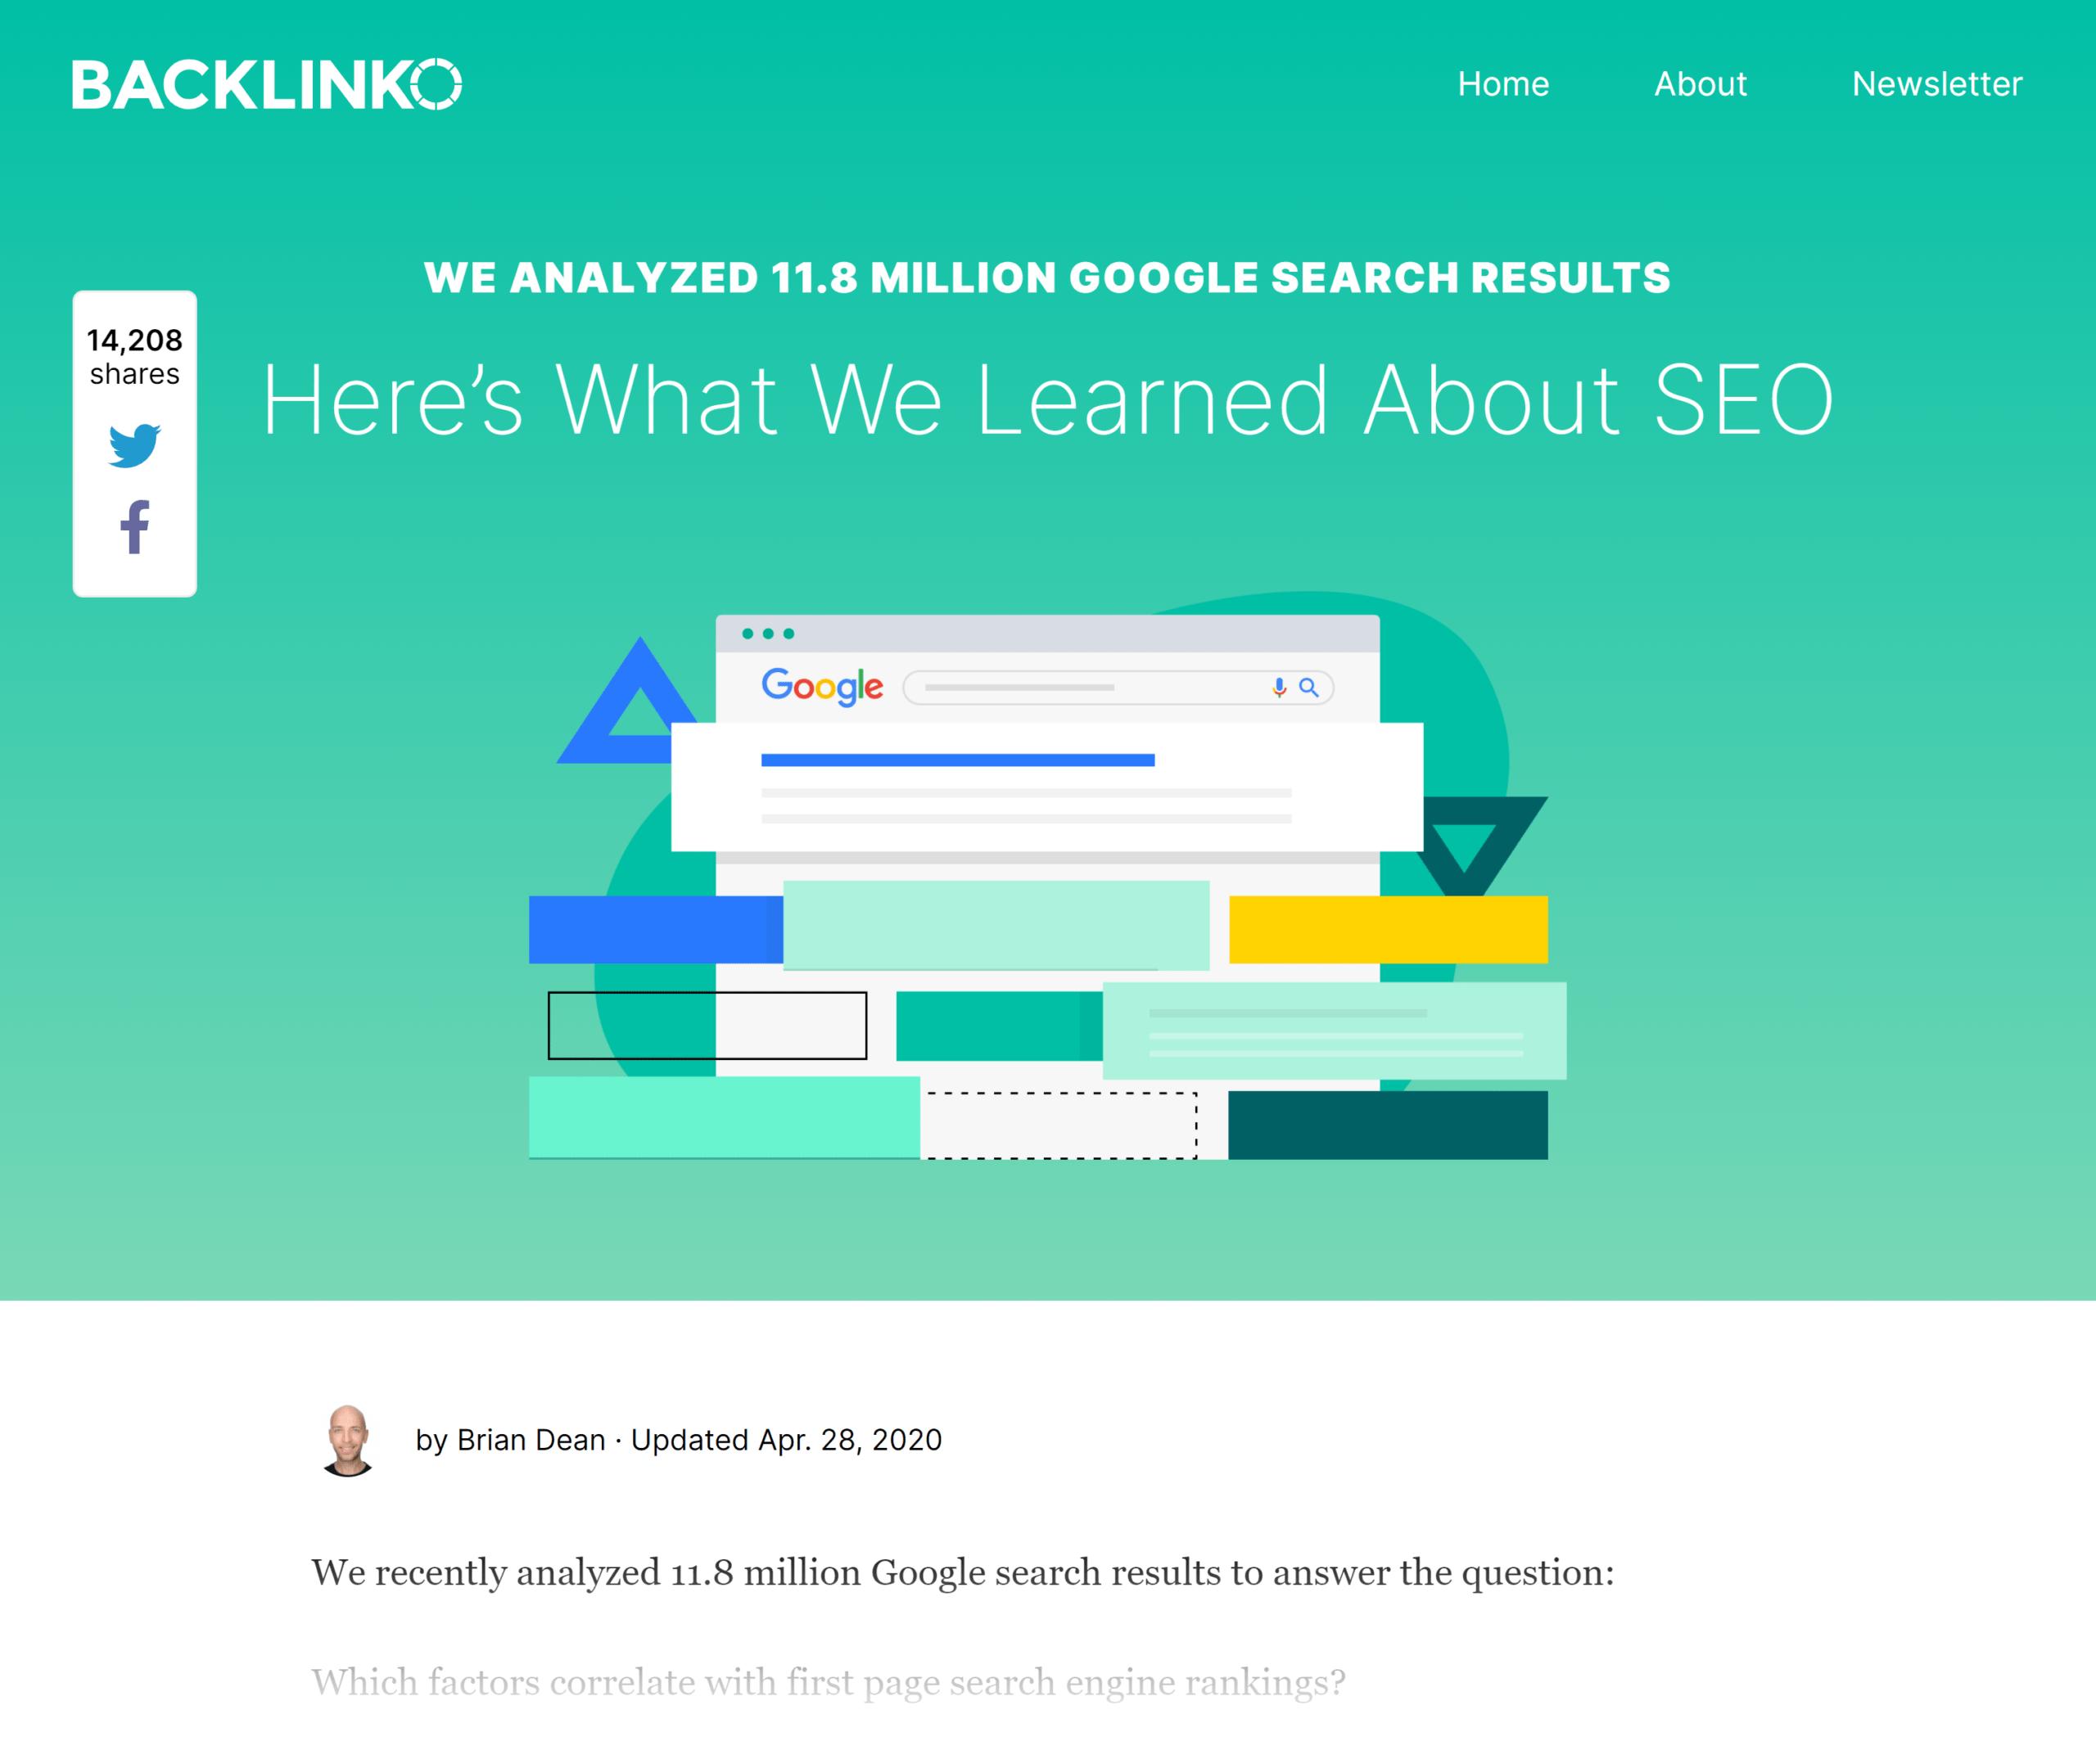 Backlinko – Search engine ranking